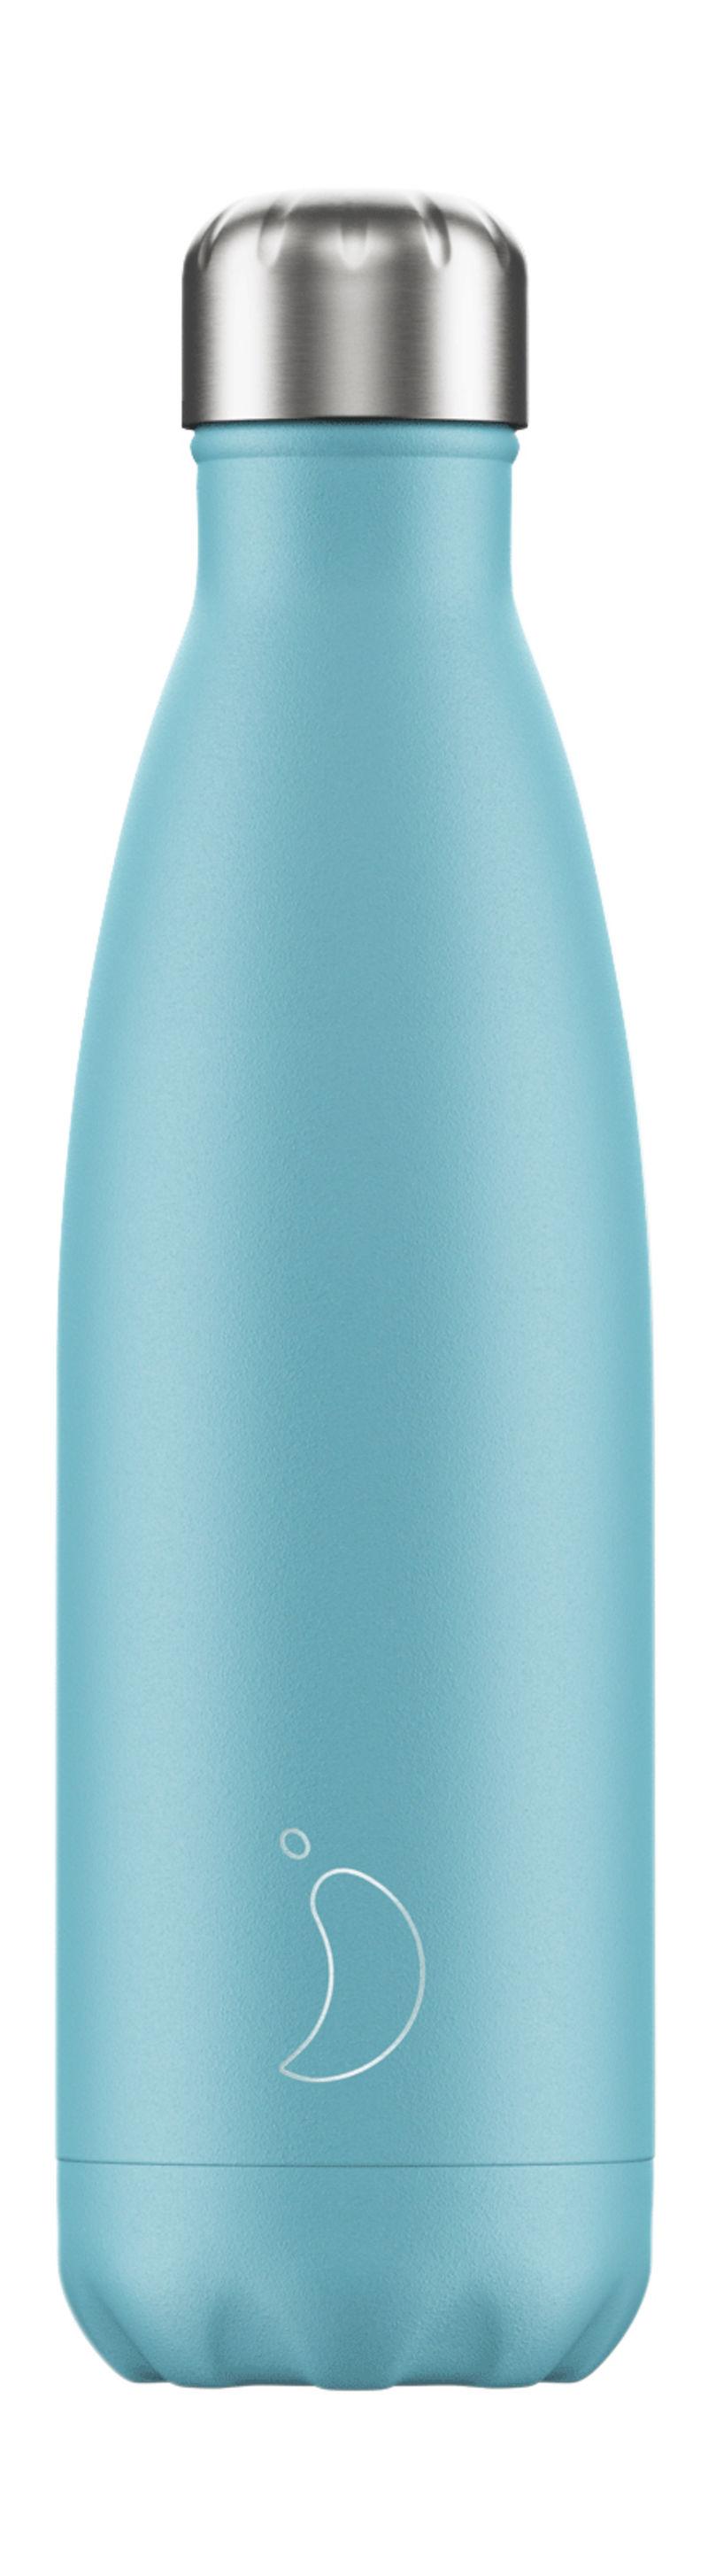 Botella Inox Azul Pastel 500ml -